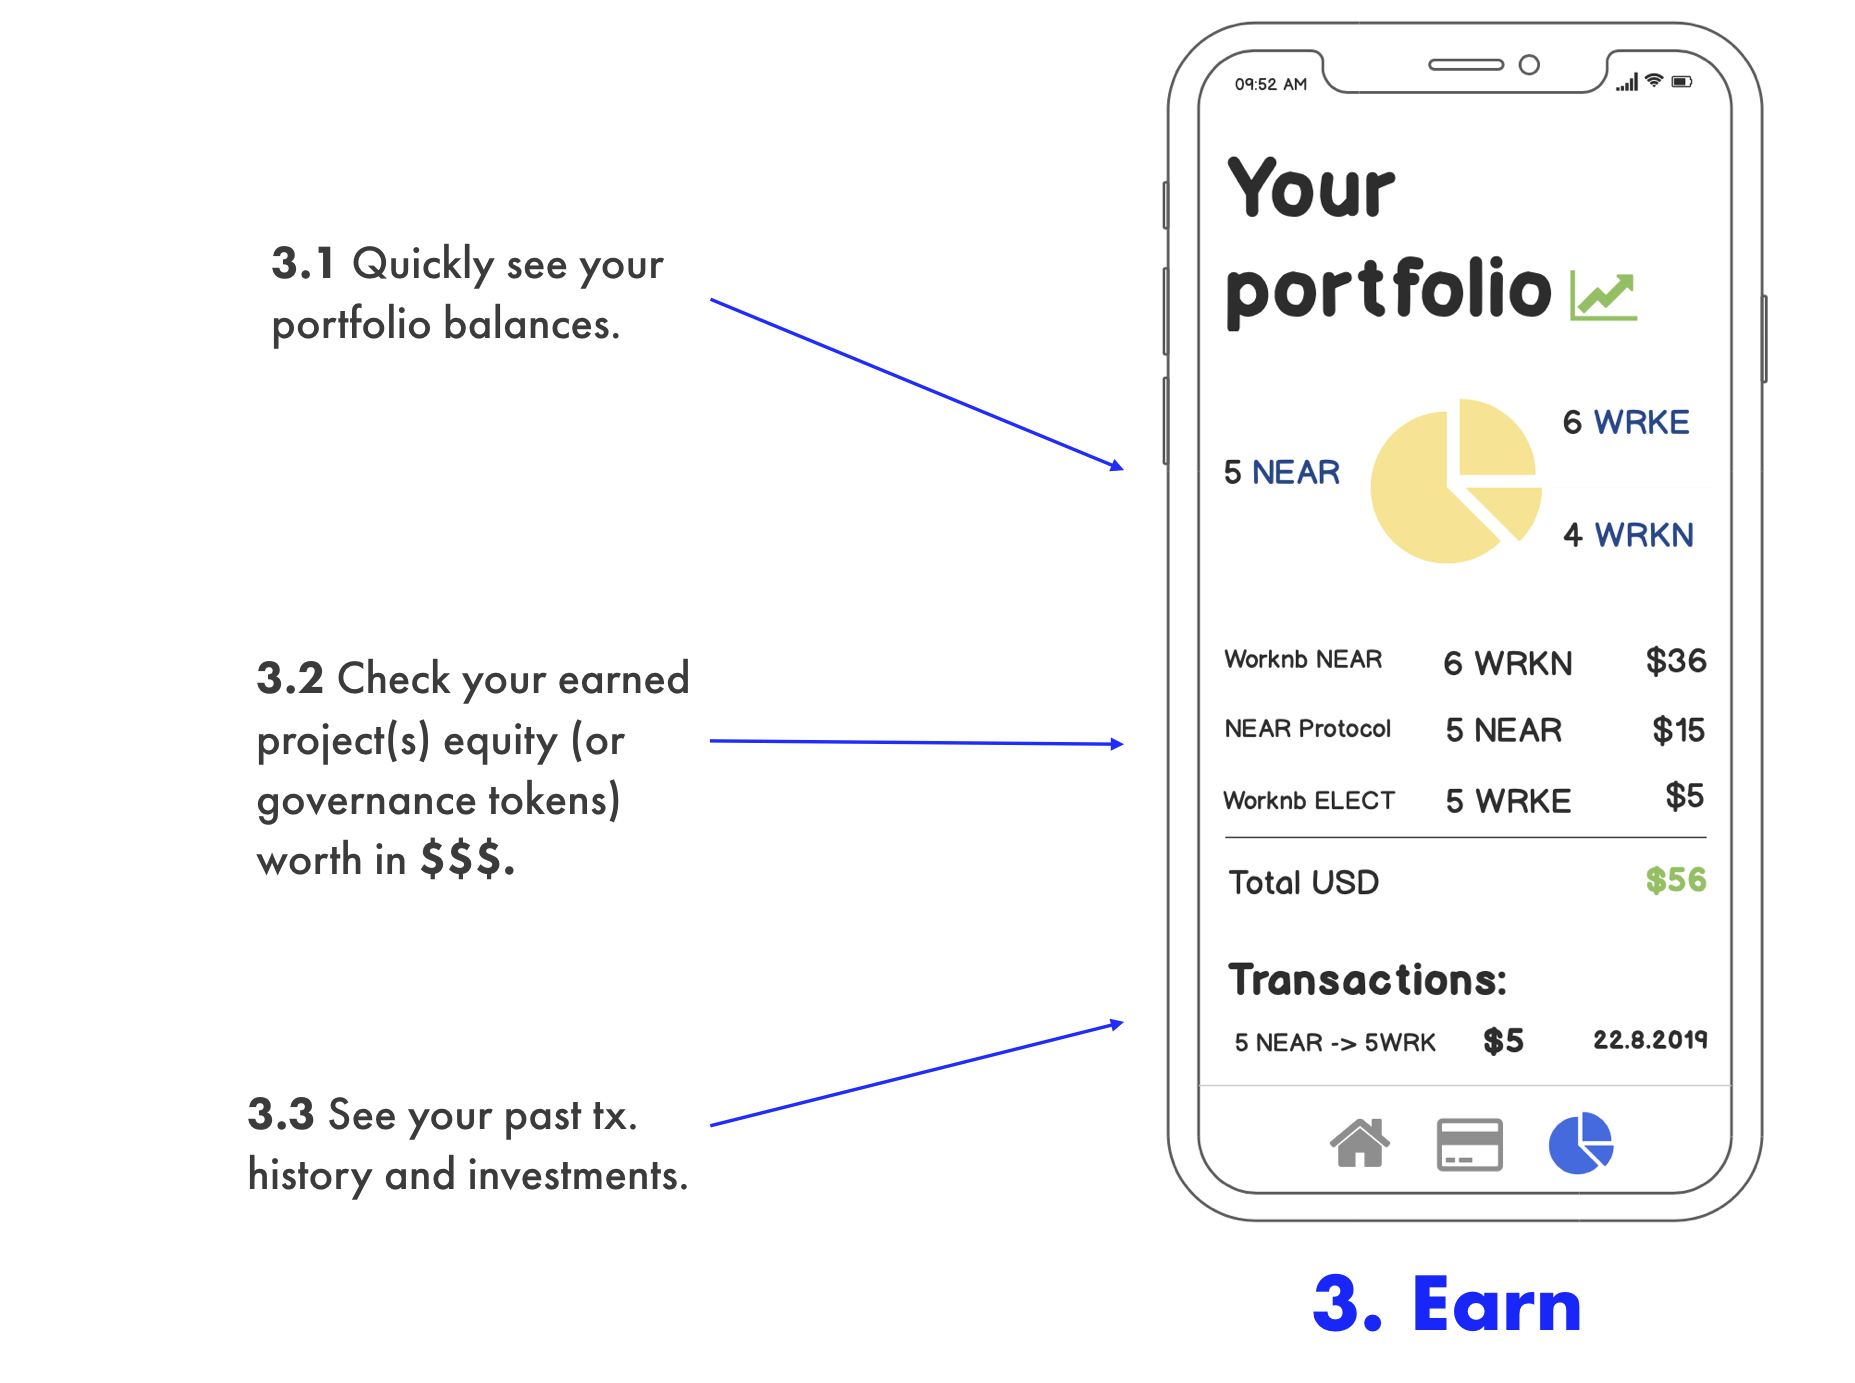 Worknb dApp -  Your Portfolio